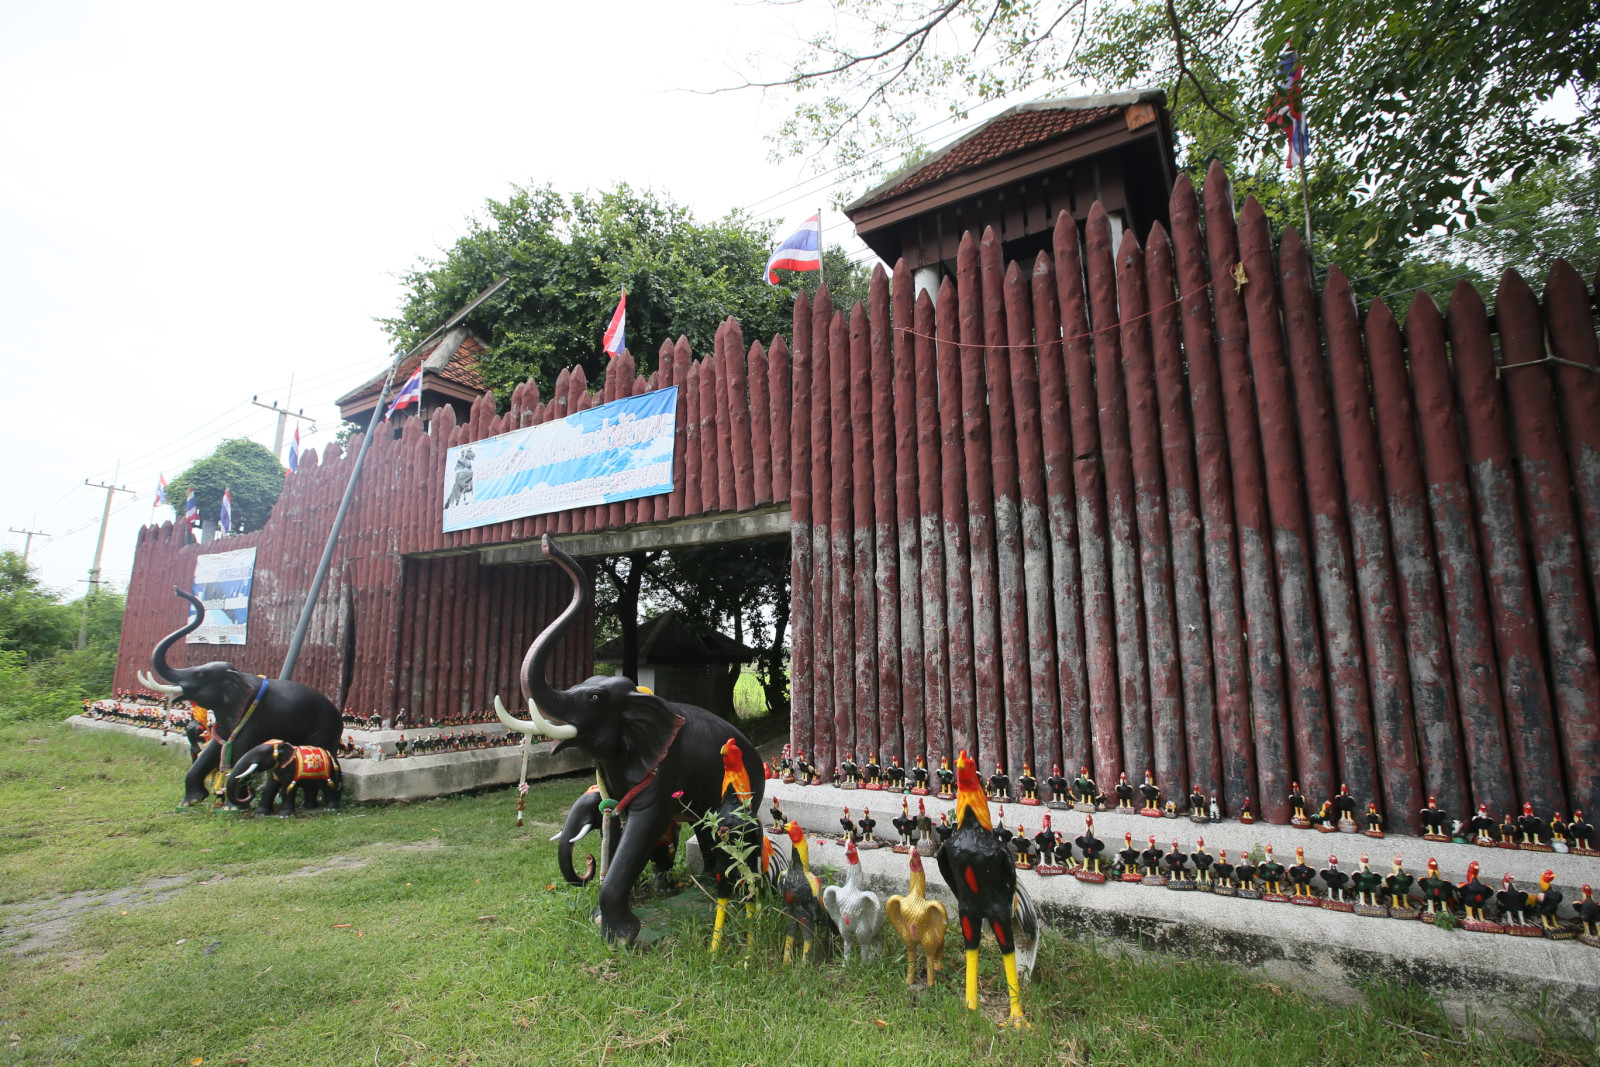 Fort at Bang Rachan Memorial Park in Sing Buri Province. Photo taken on July 19, 2017.